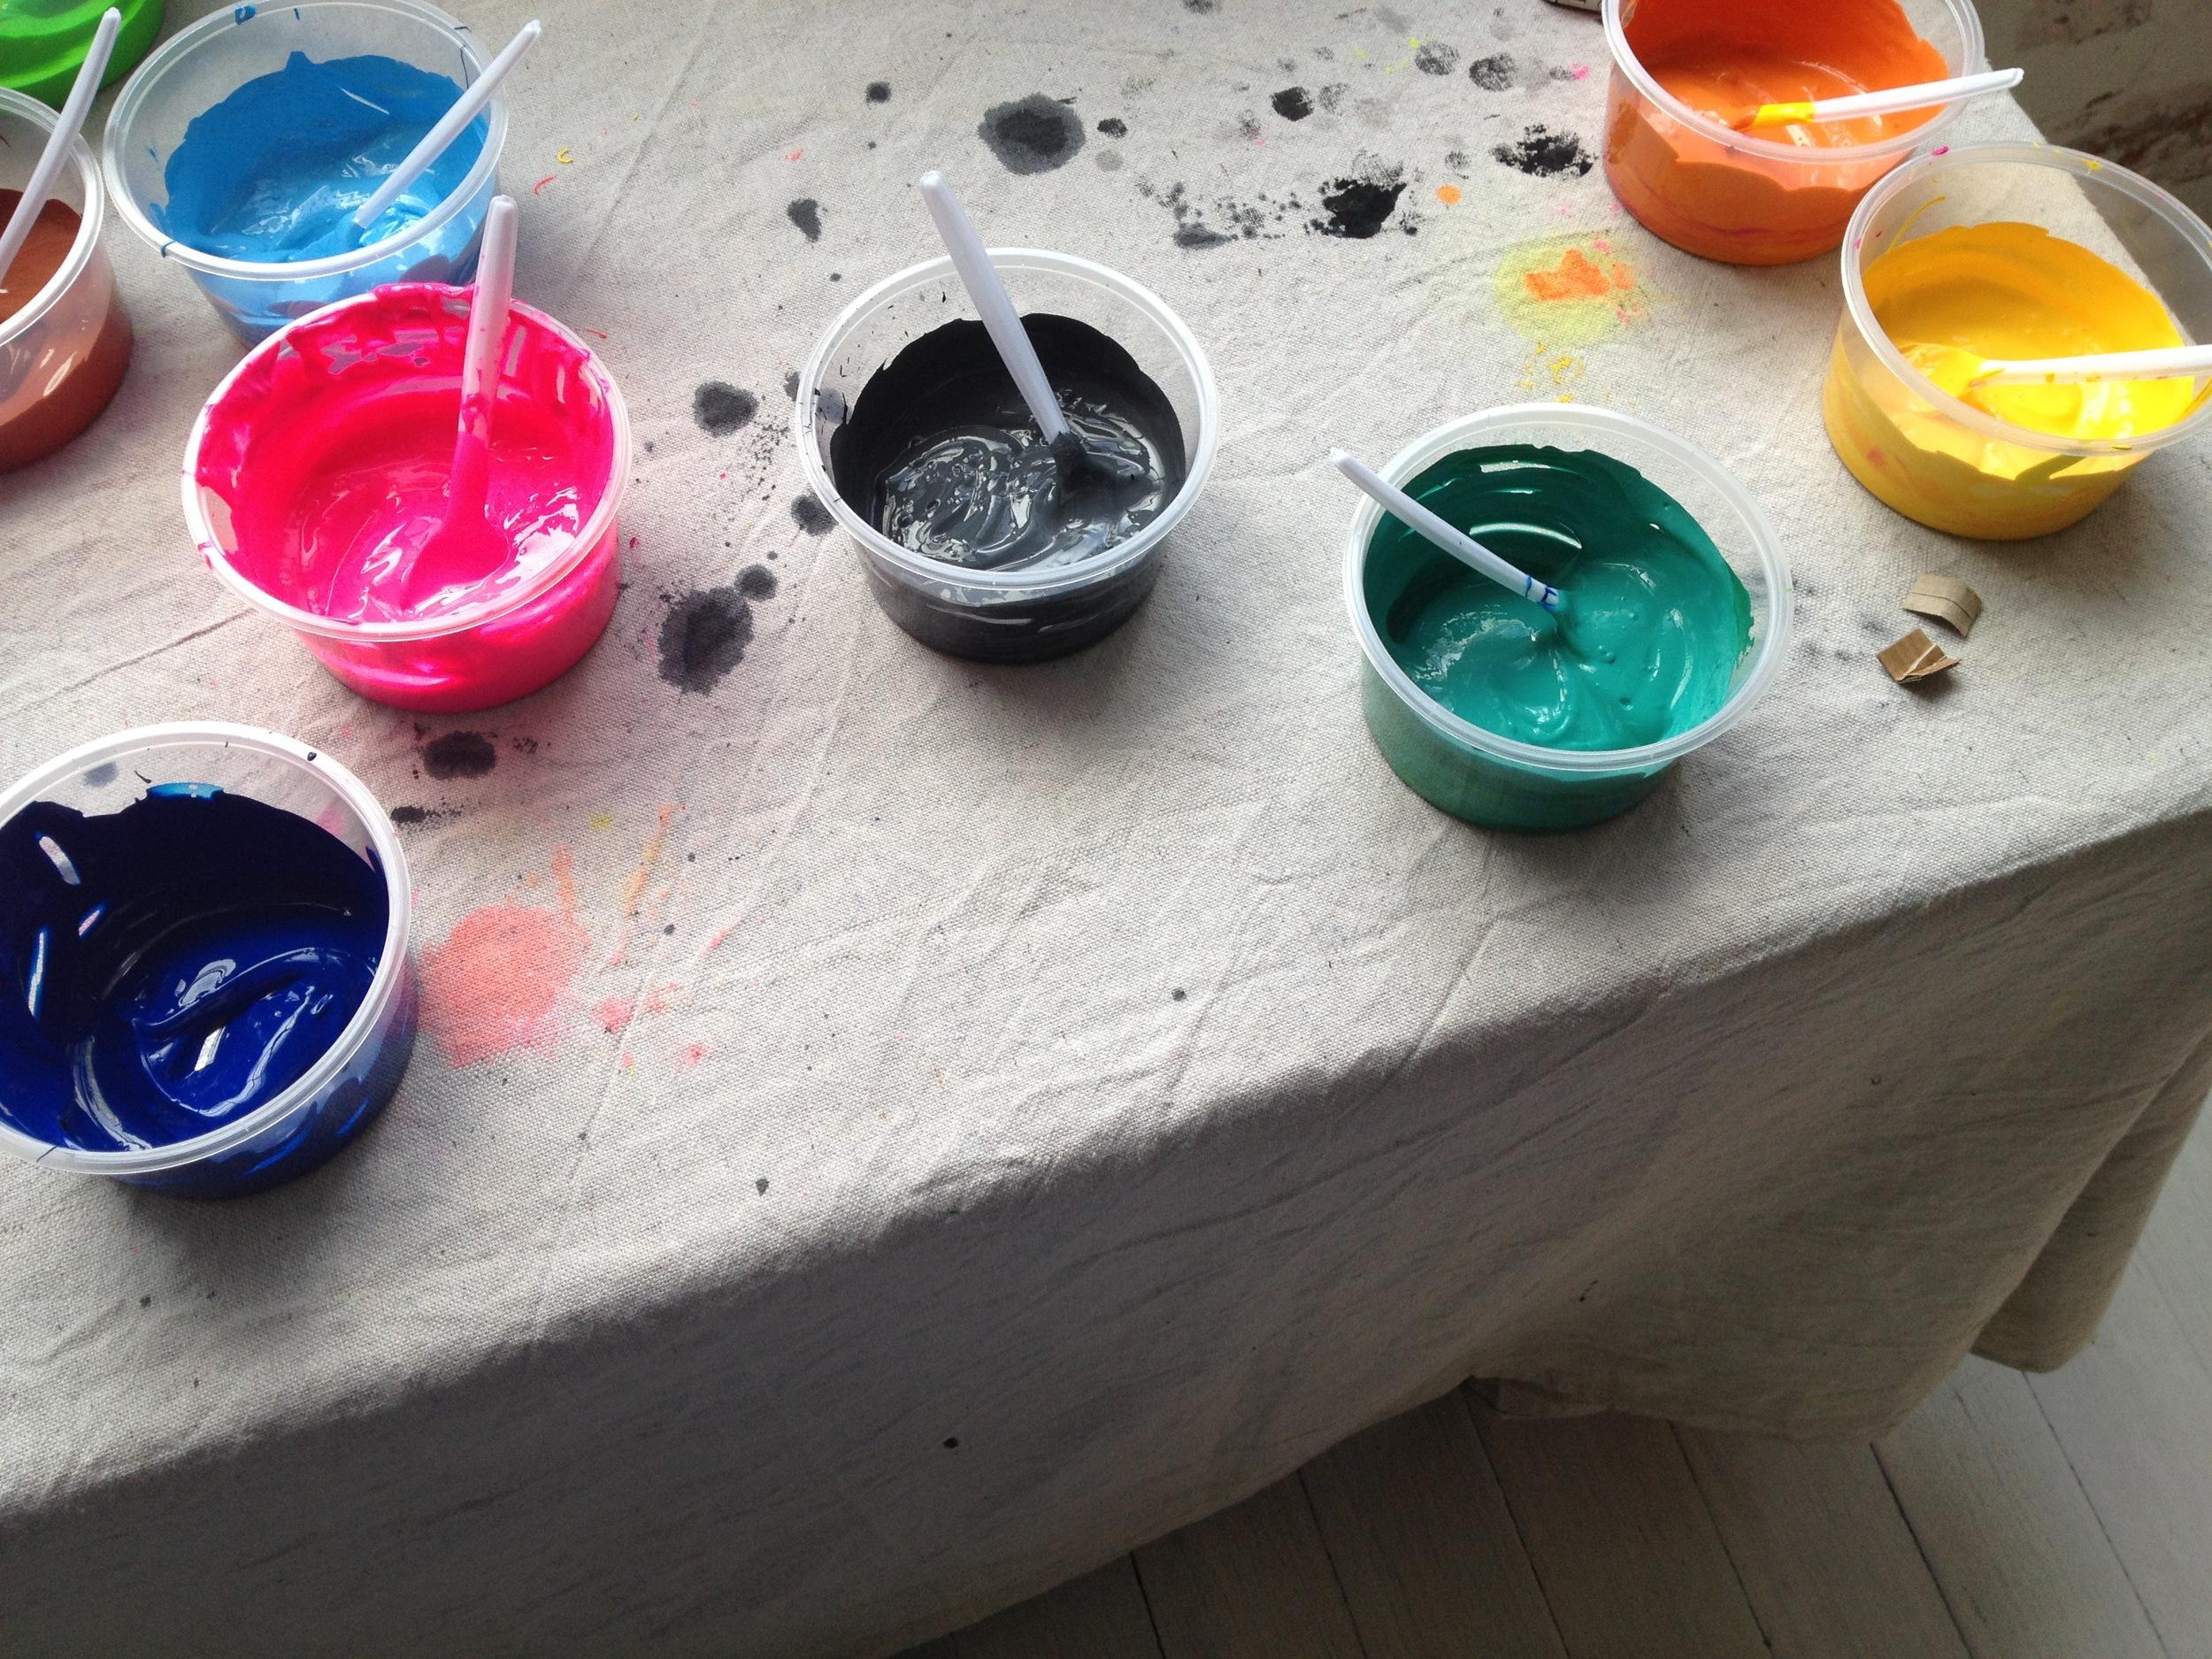 Ink mixing at Rachel Castle/Megan Morton's The School screen printing class.